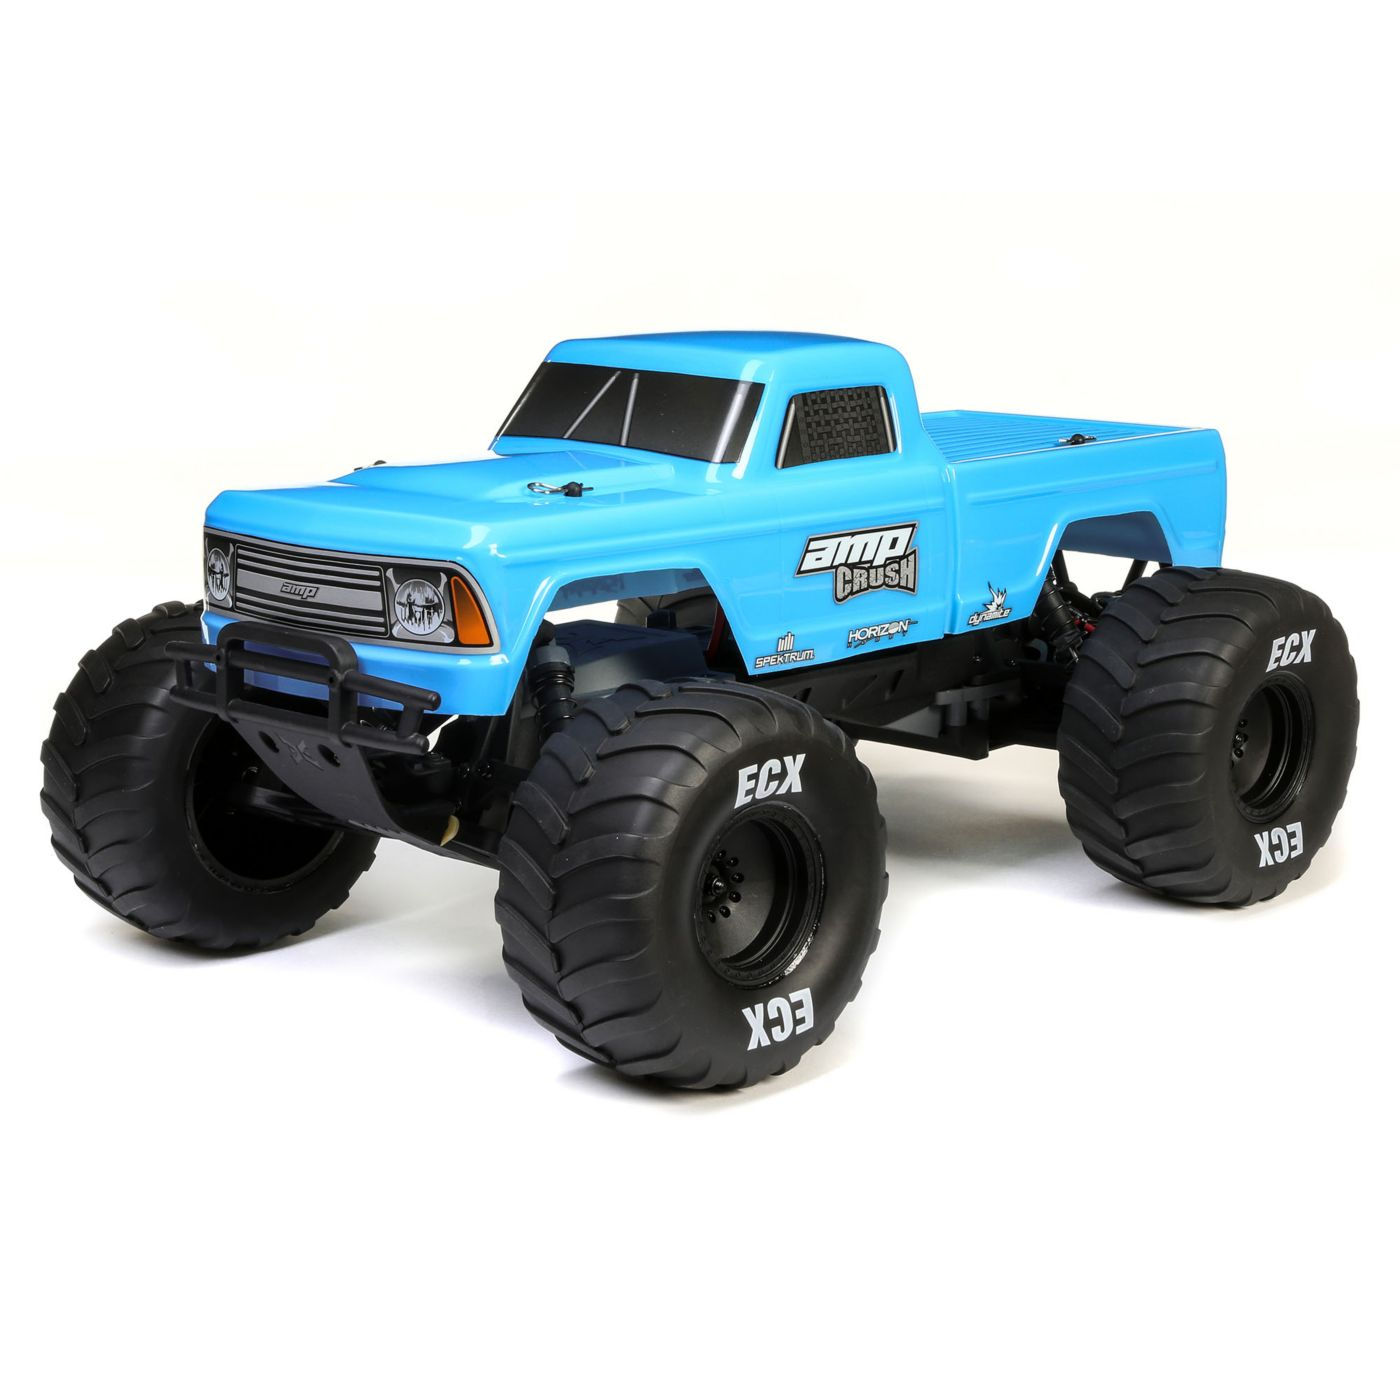 ECX Amp Crush 1/10-scale R/C Monster Truck